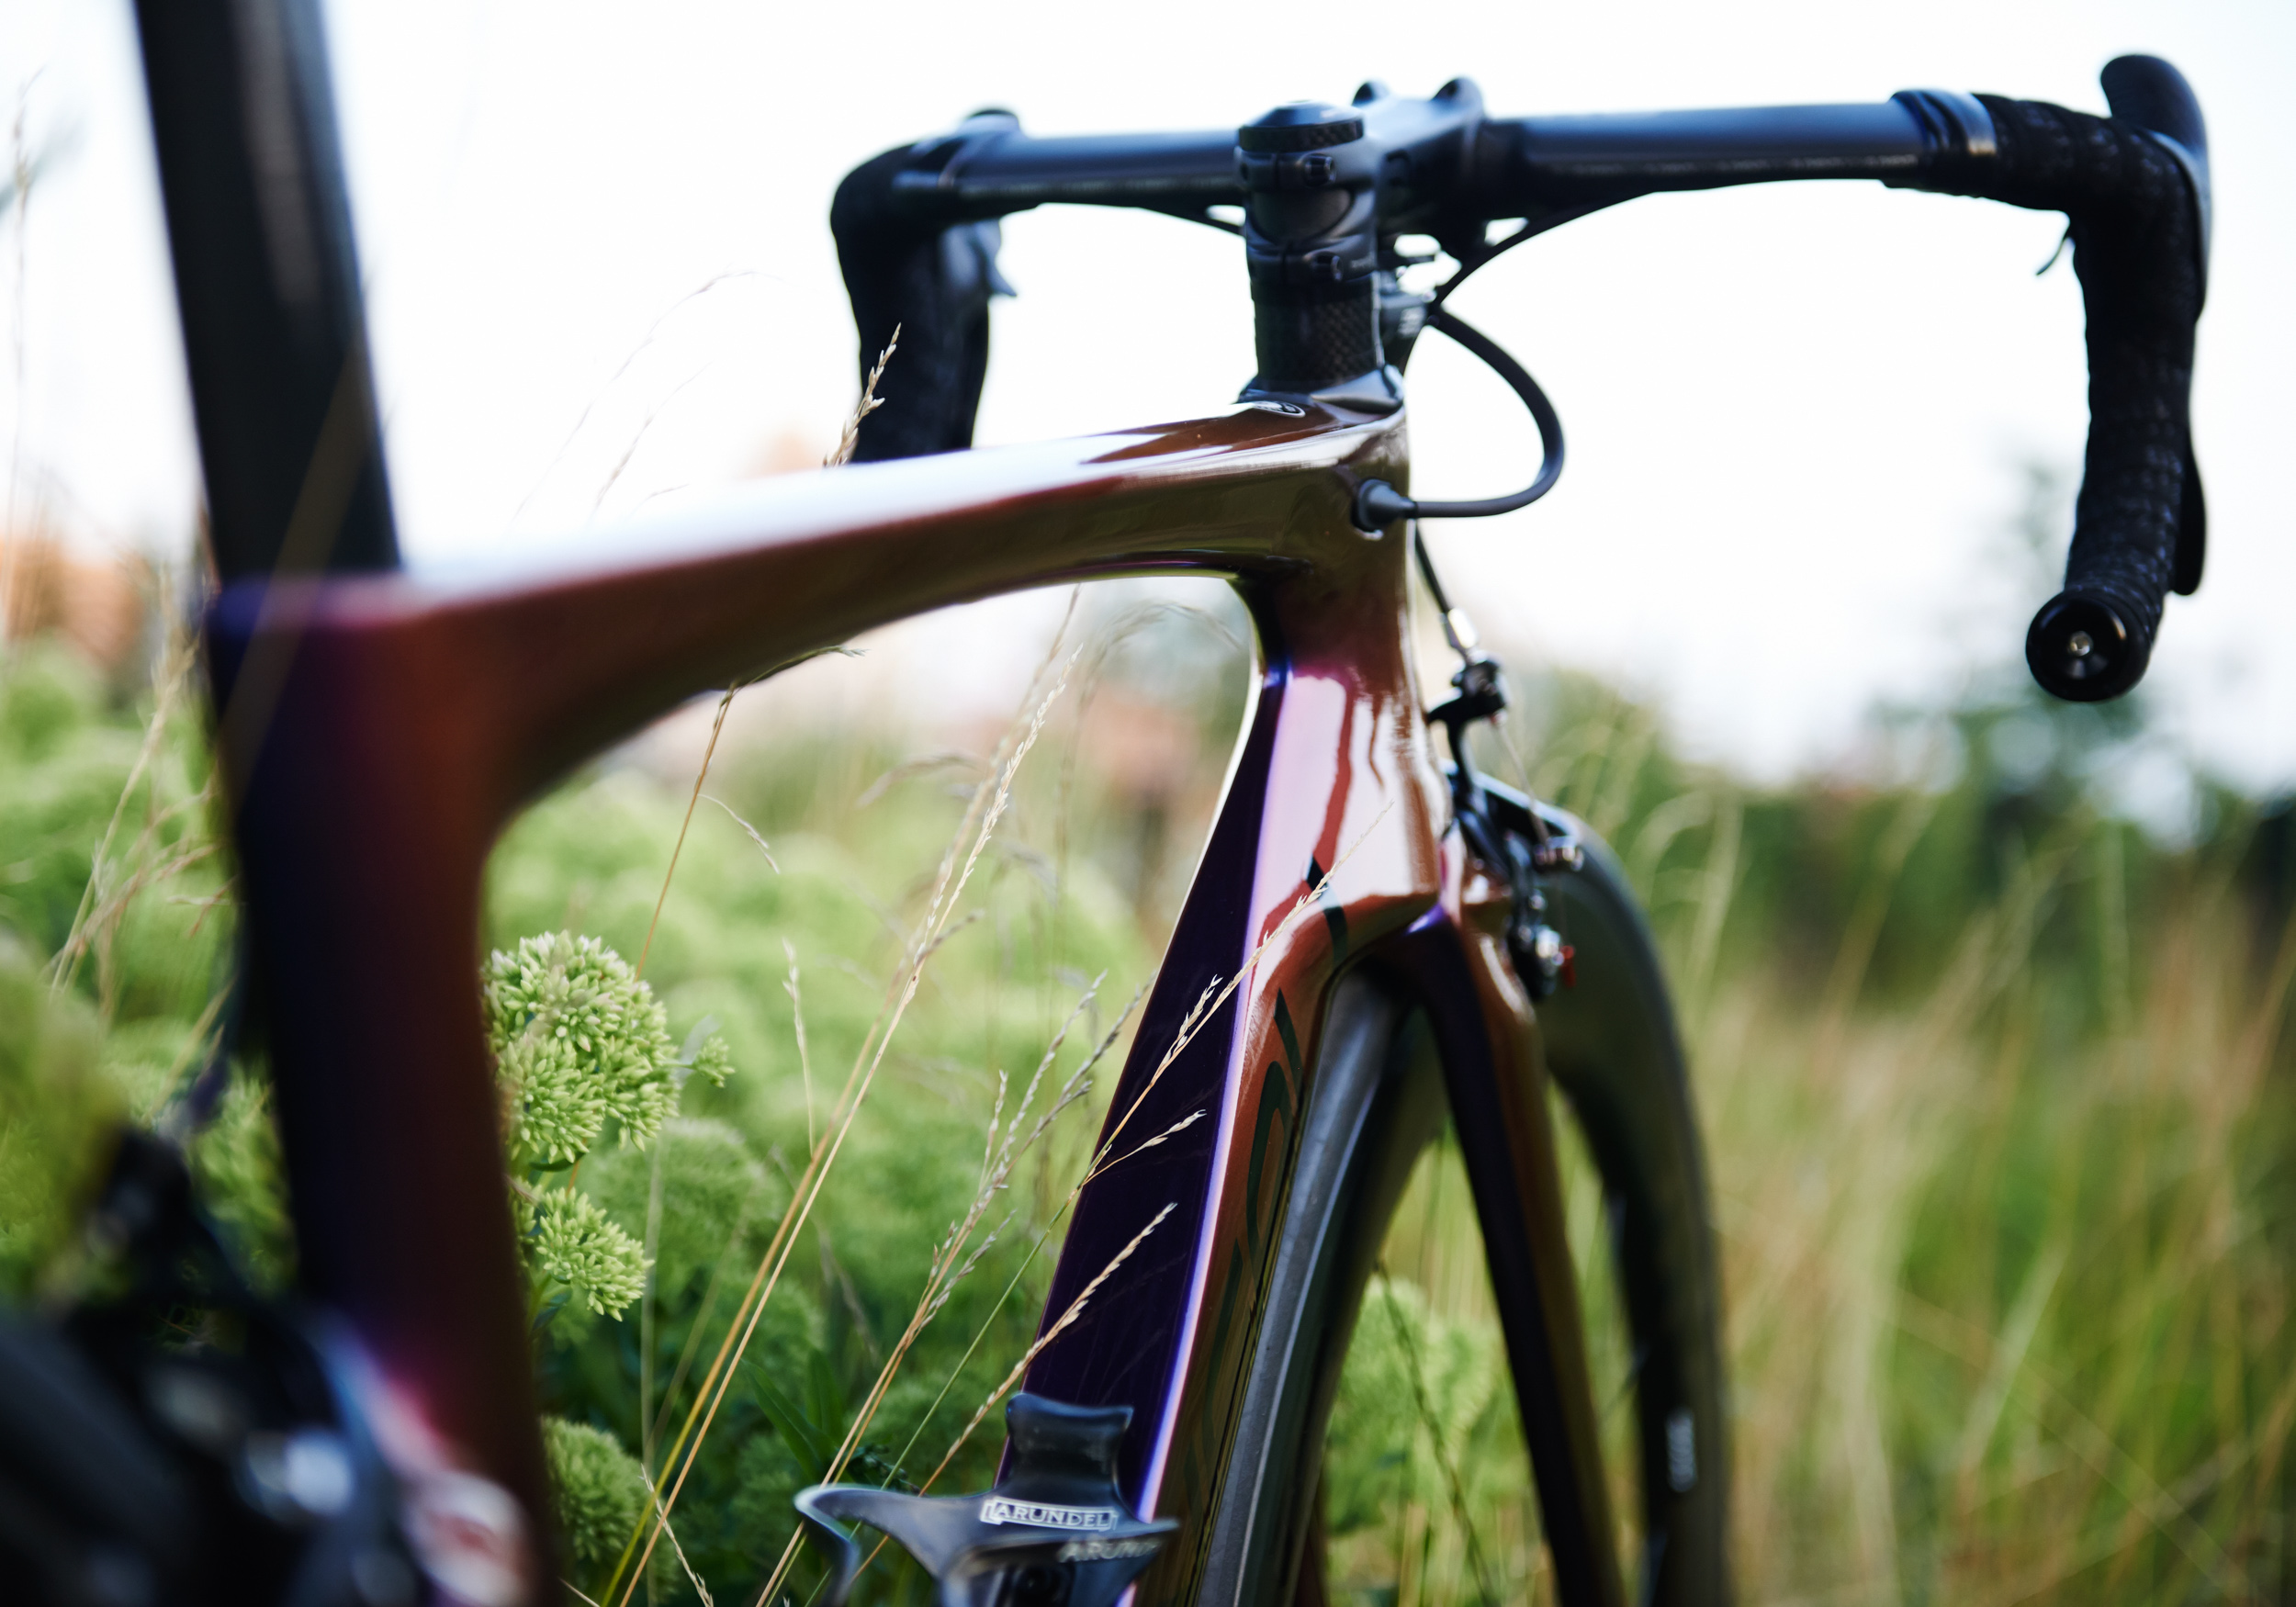 to-be-determined-garneau-a1-bike-review-110.jpg